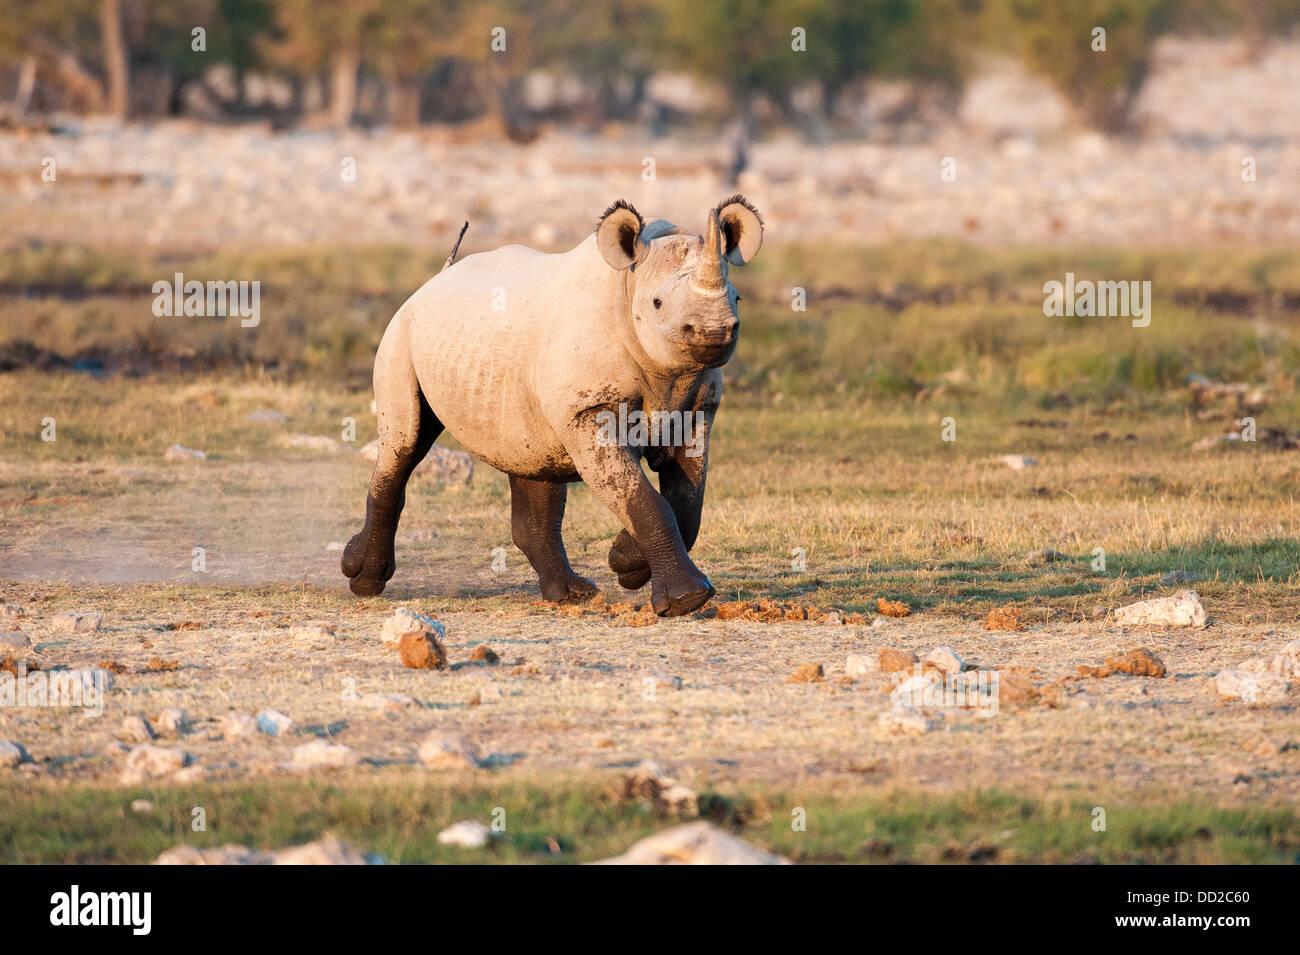 Black rhino (Diceros bicornis) charging, Rietfontein waterhole in Etosha Nationalpark, Namibia - Stock Image